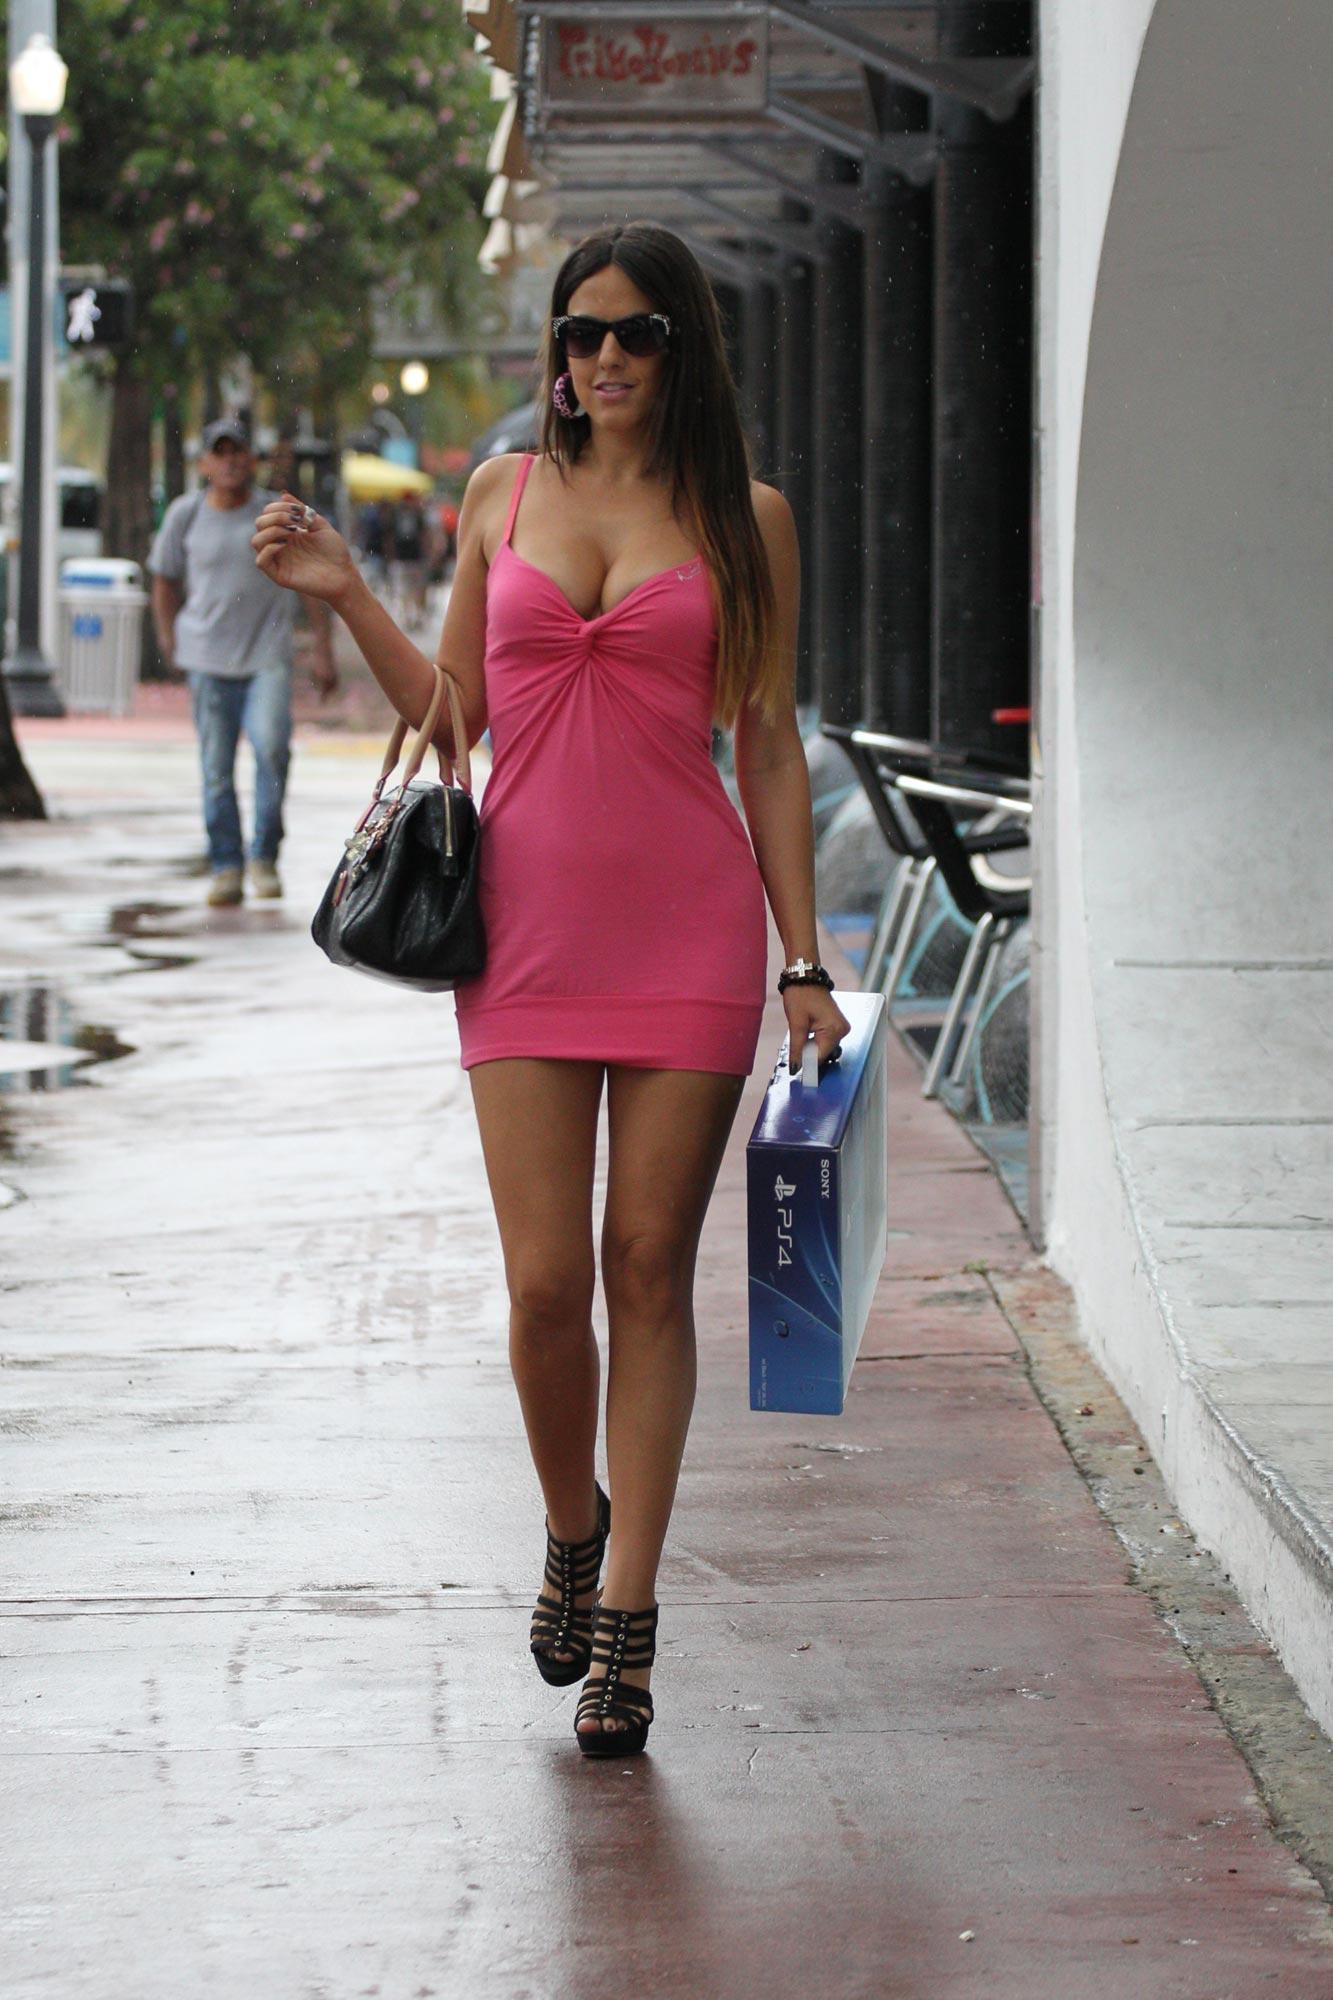 Claudia Romani Street Style Shopping In Miami November 2013 Fashion Paaaarty Datenight